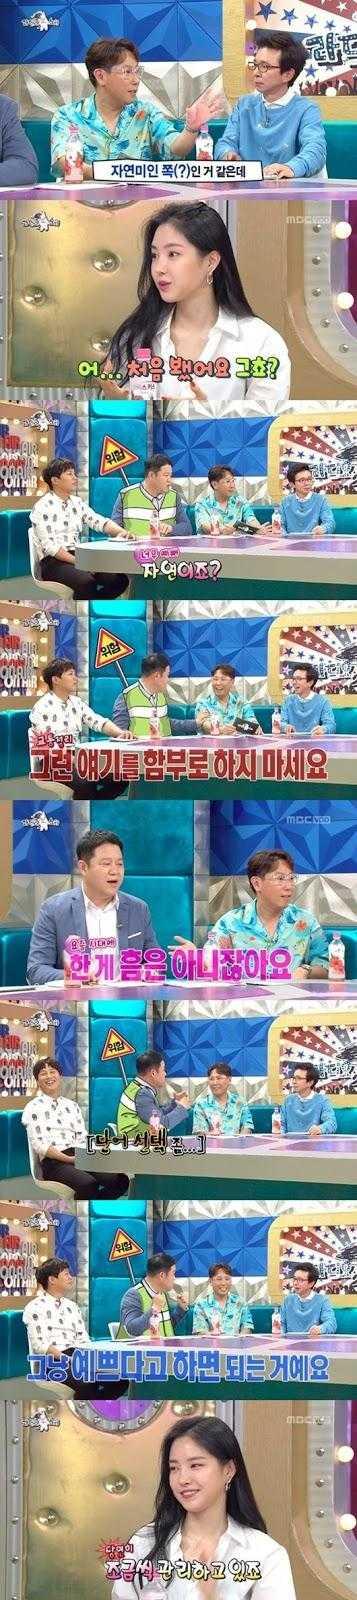 "'Radio Star'ın Son Naeun'a ""doğal mısın"" diye sorması kaba mıydı?"